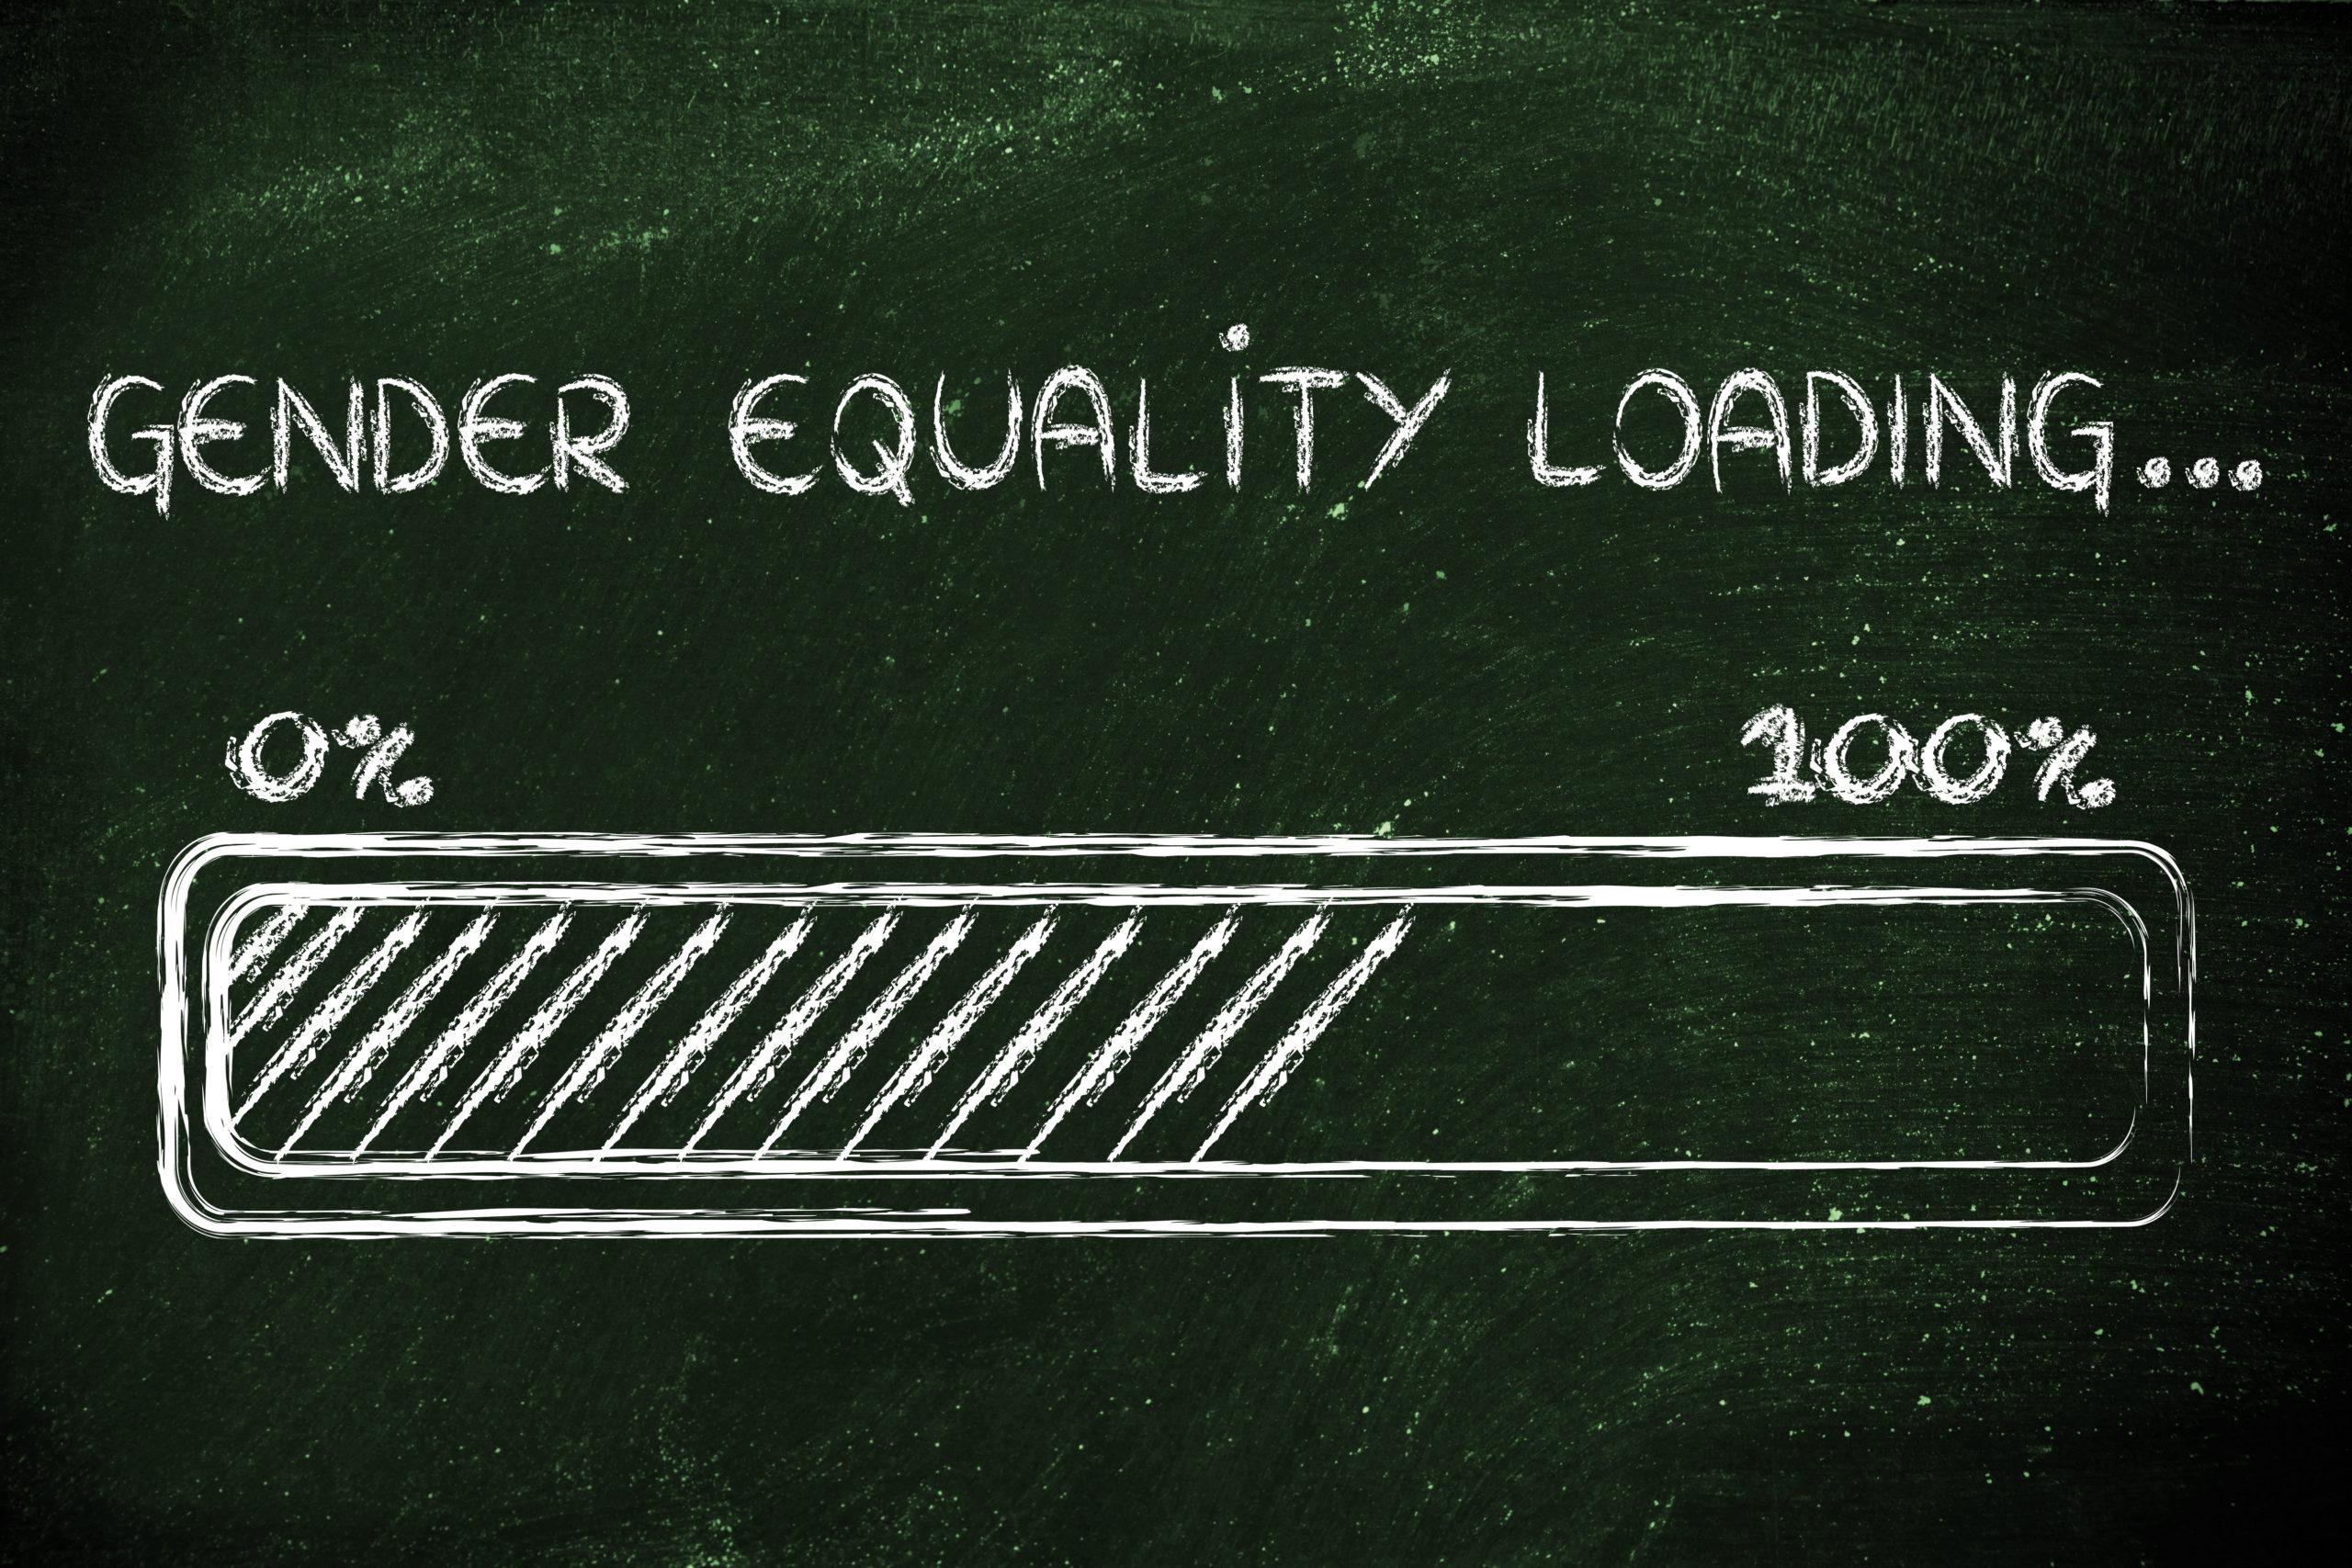 progress bar metaphorically loading more gender equality